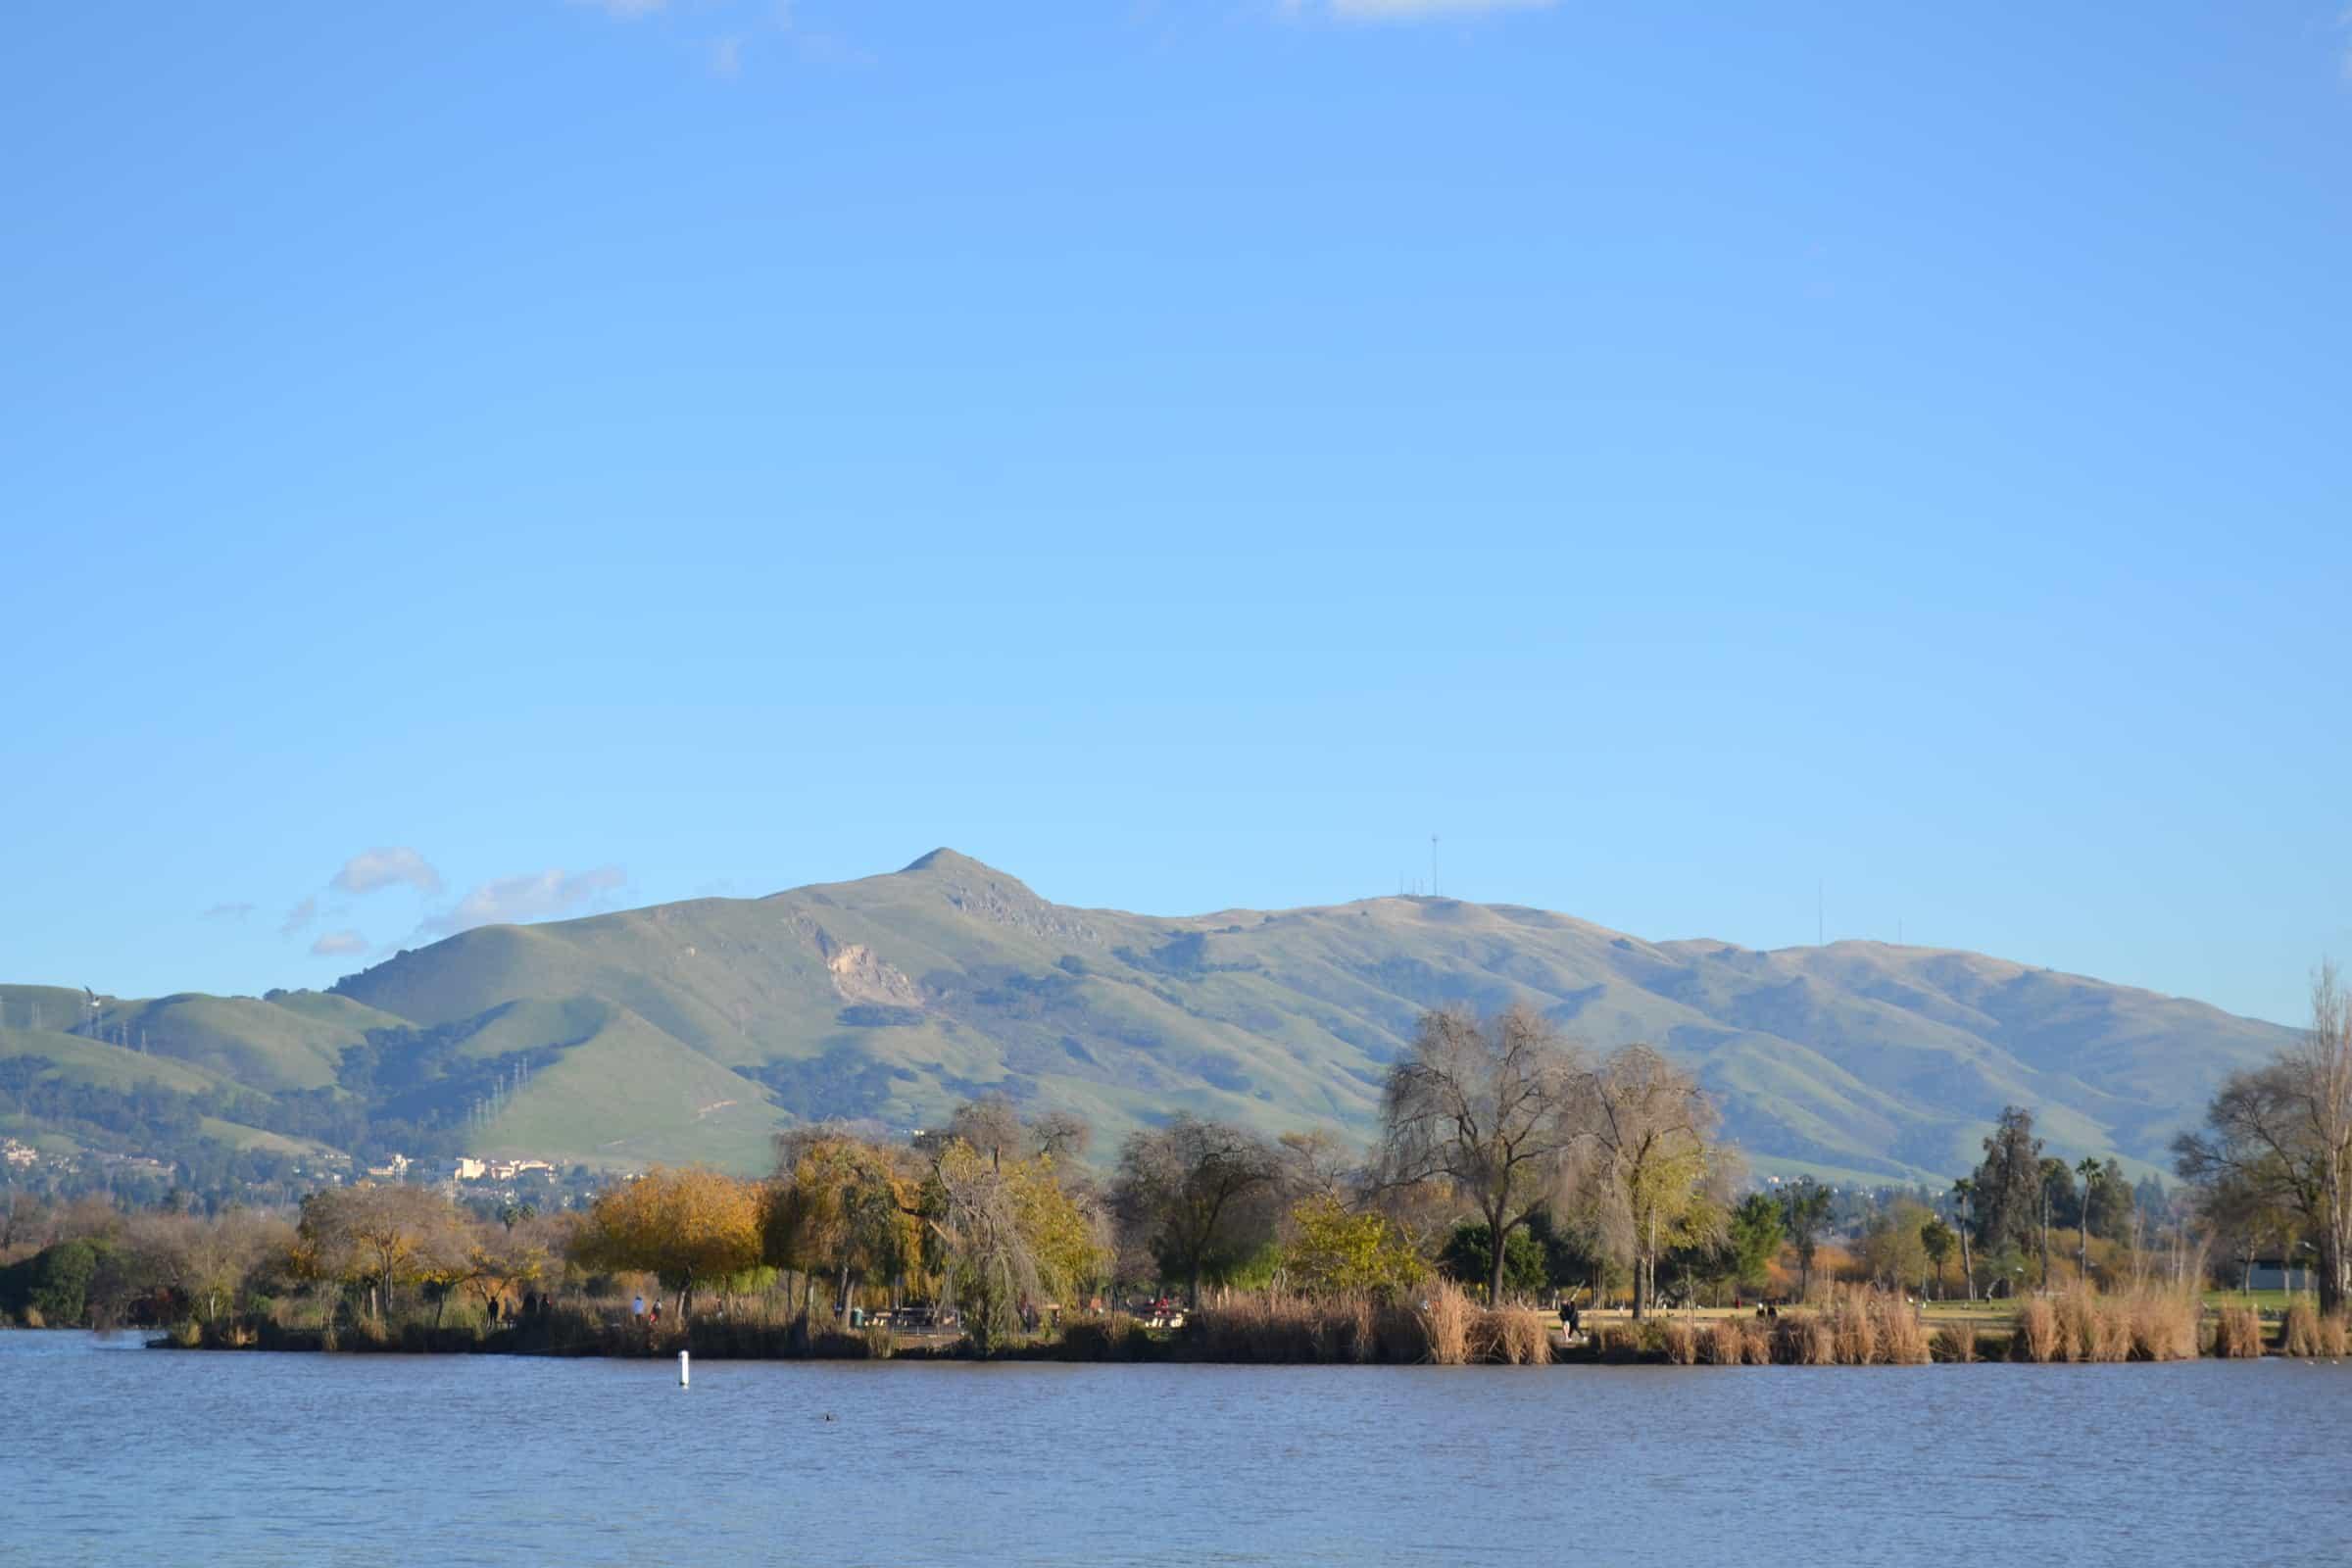 Mission_Peak_over_Lake_Elizabeth,_in_Fremont,_California